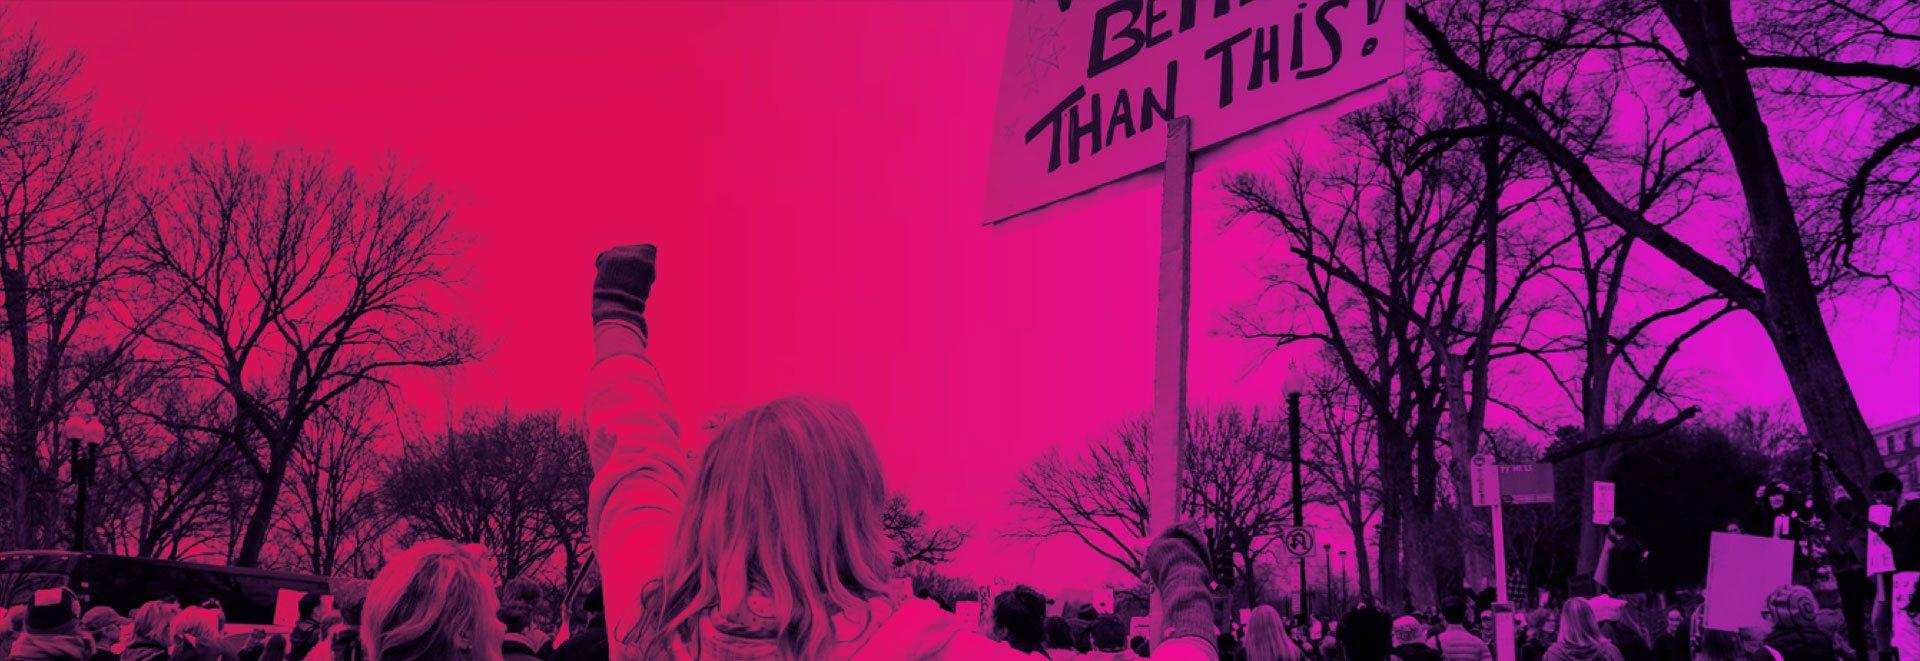 Manifest header - Empathy Rocks - agencja Design Thinking i Service Design